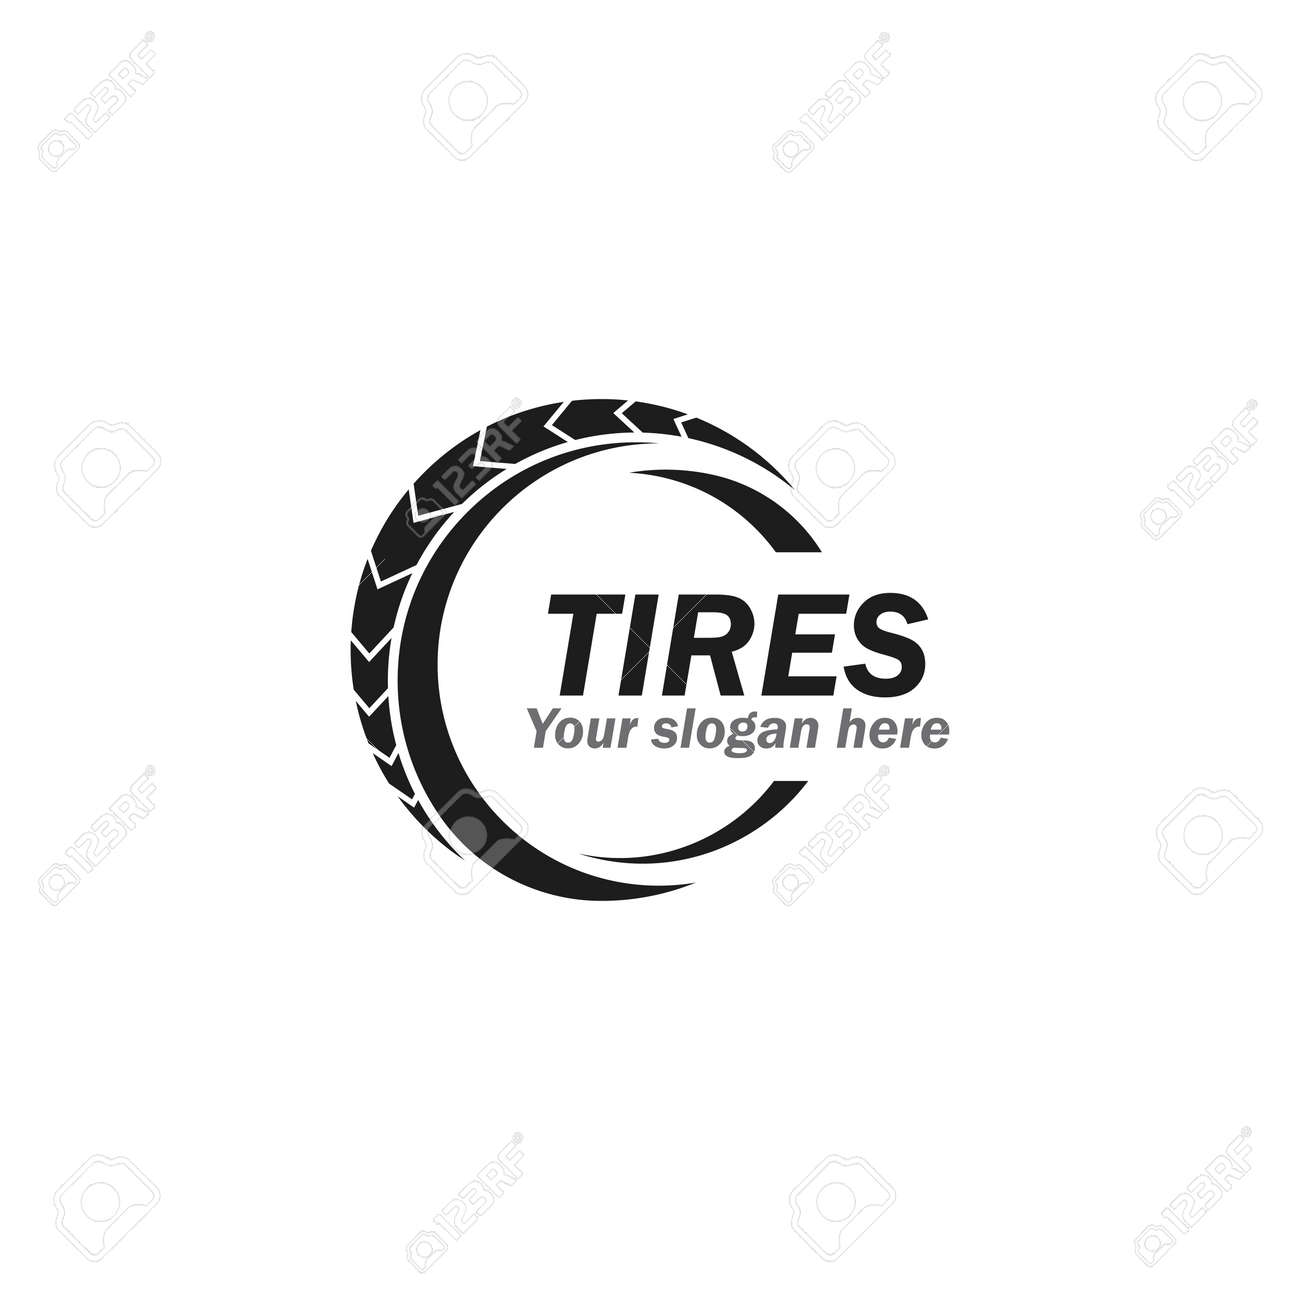 Tires illustration vector design - 157212427